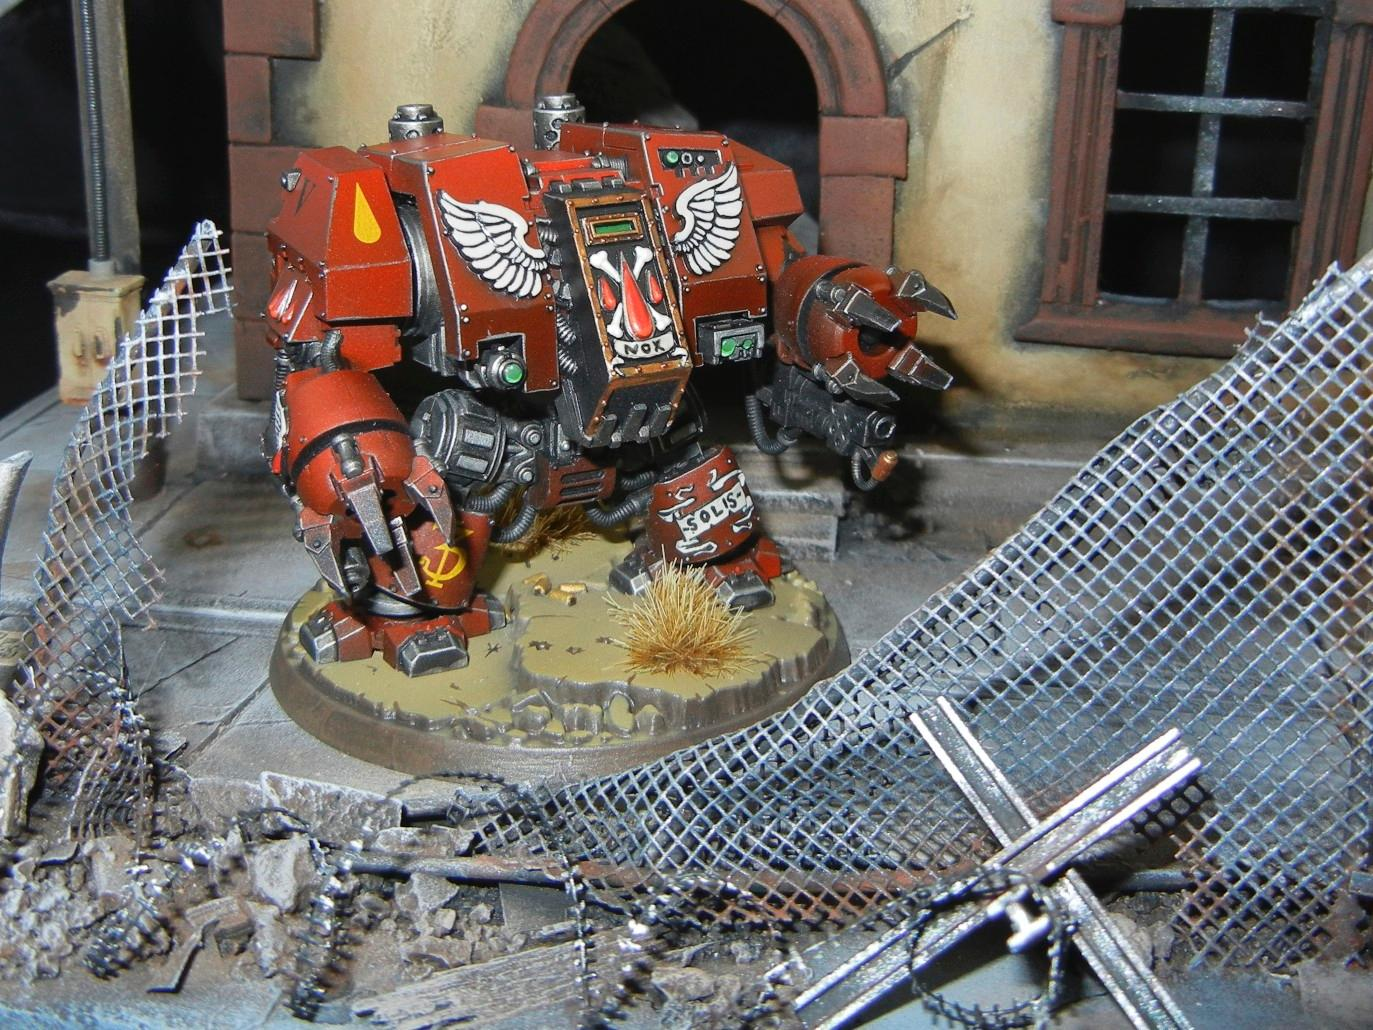 Blood Angels, Dreadnought, Furioso, Space Marines, Warhammer 40,000